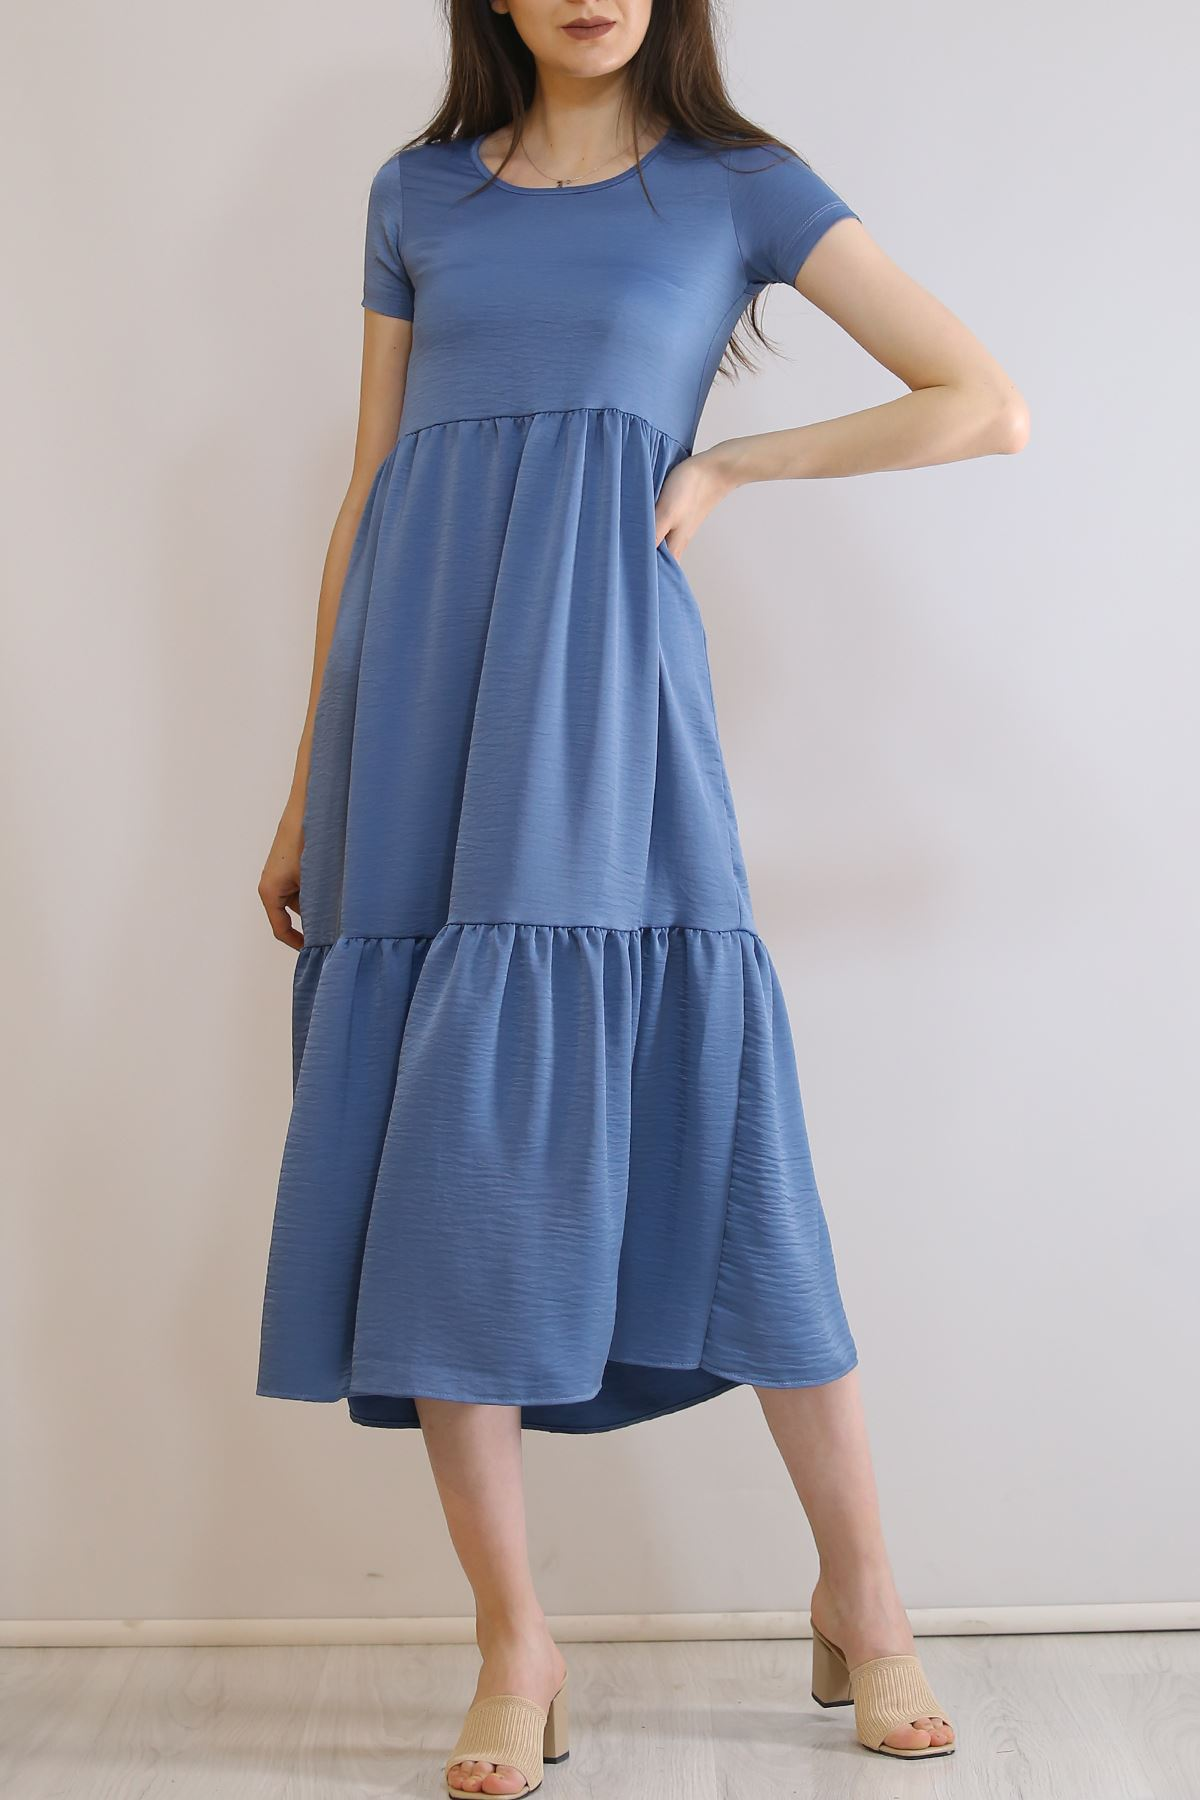 Ayrobin Elbise İndigo - 6023.1247.